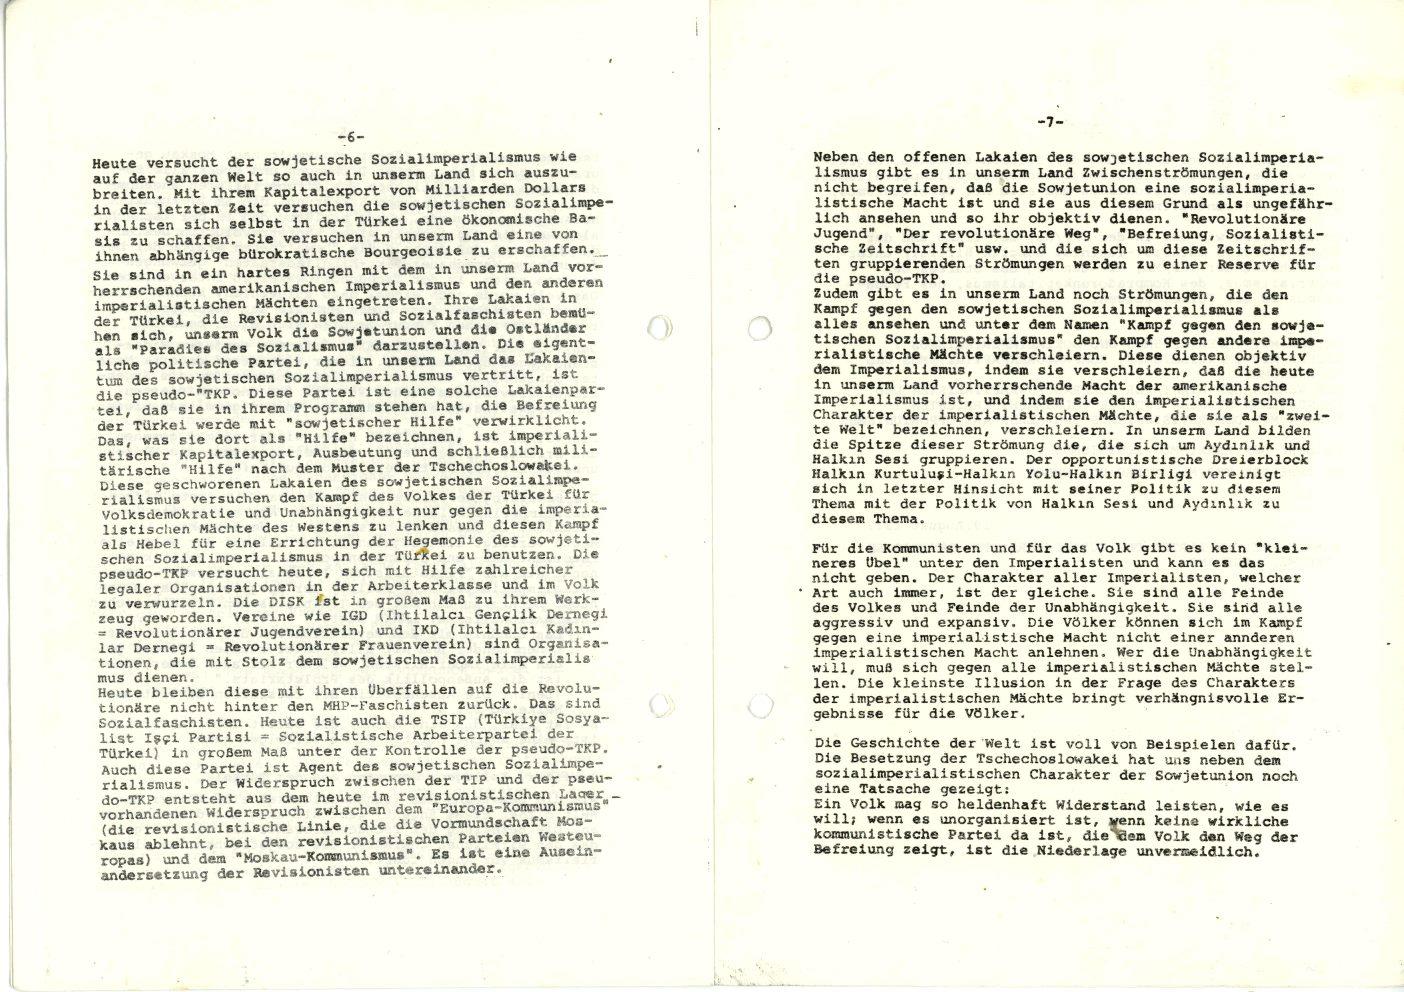 TKPML_1977_02_05